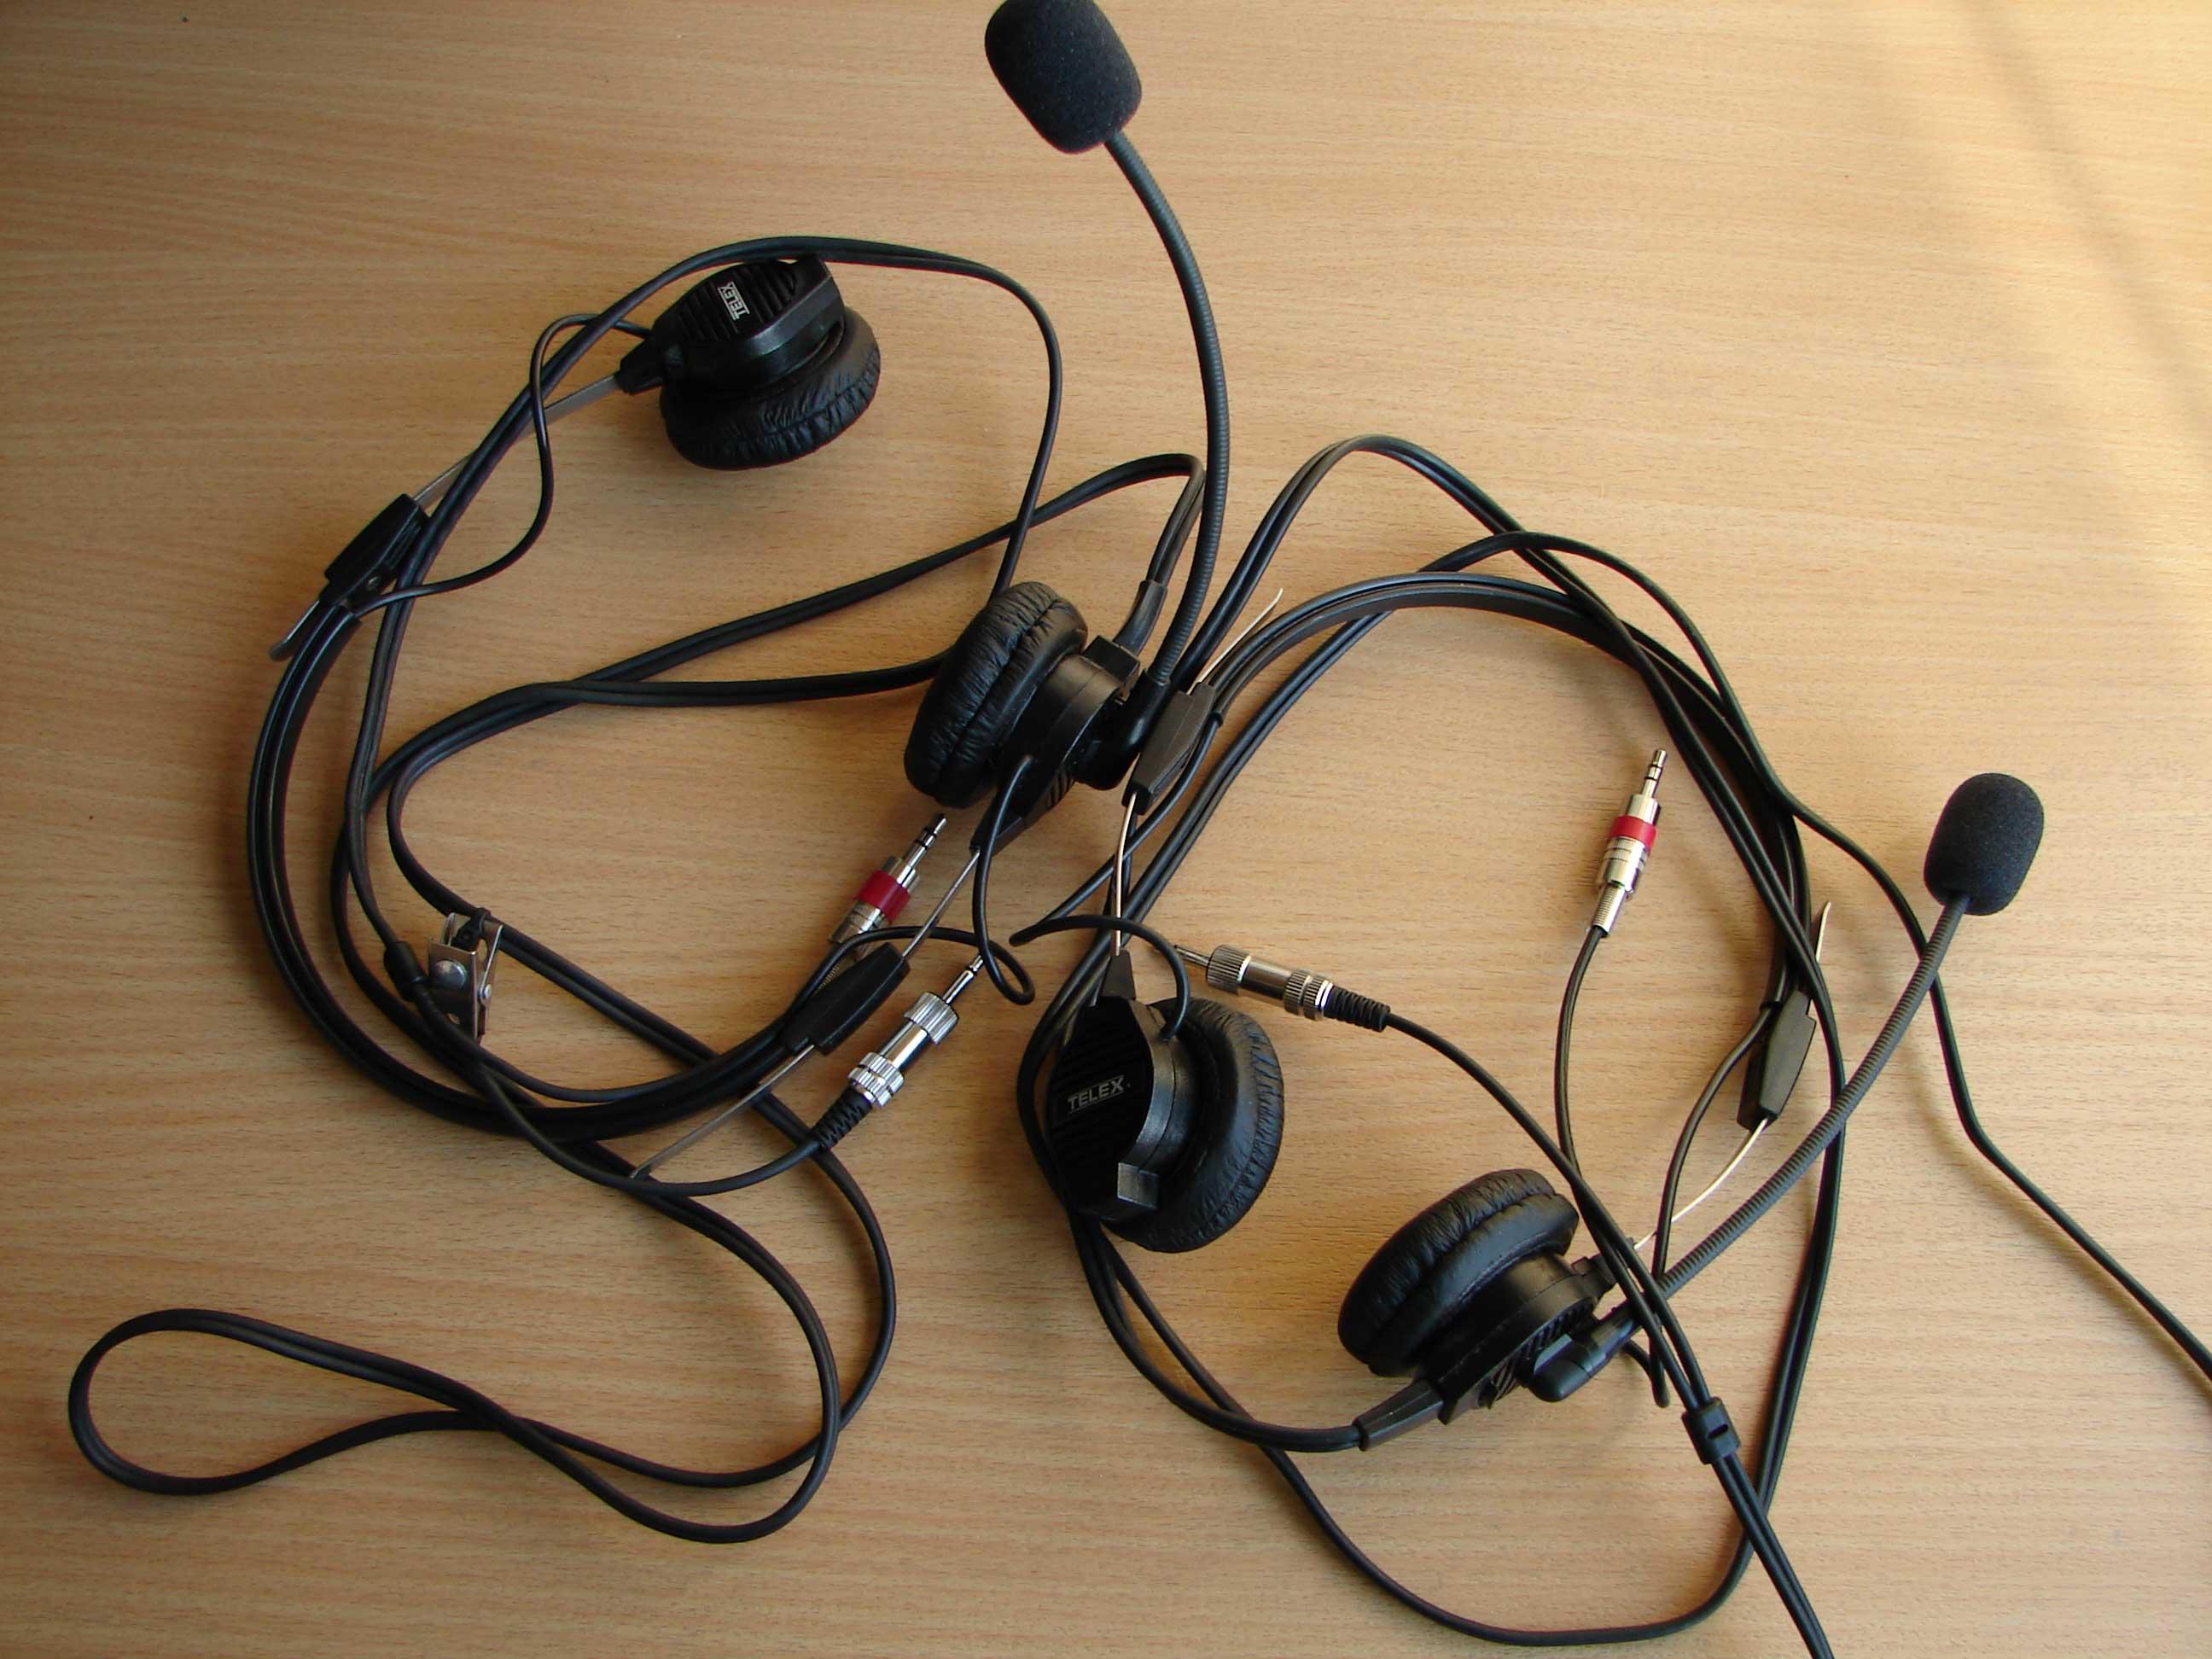 Headsets Telex Intercom Wiring Diagram Dsc02496